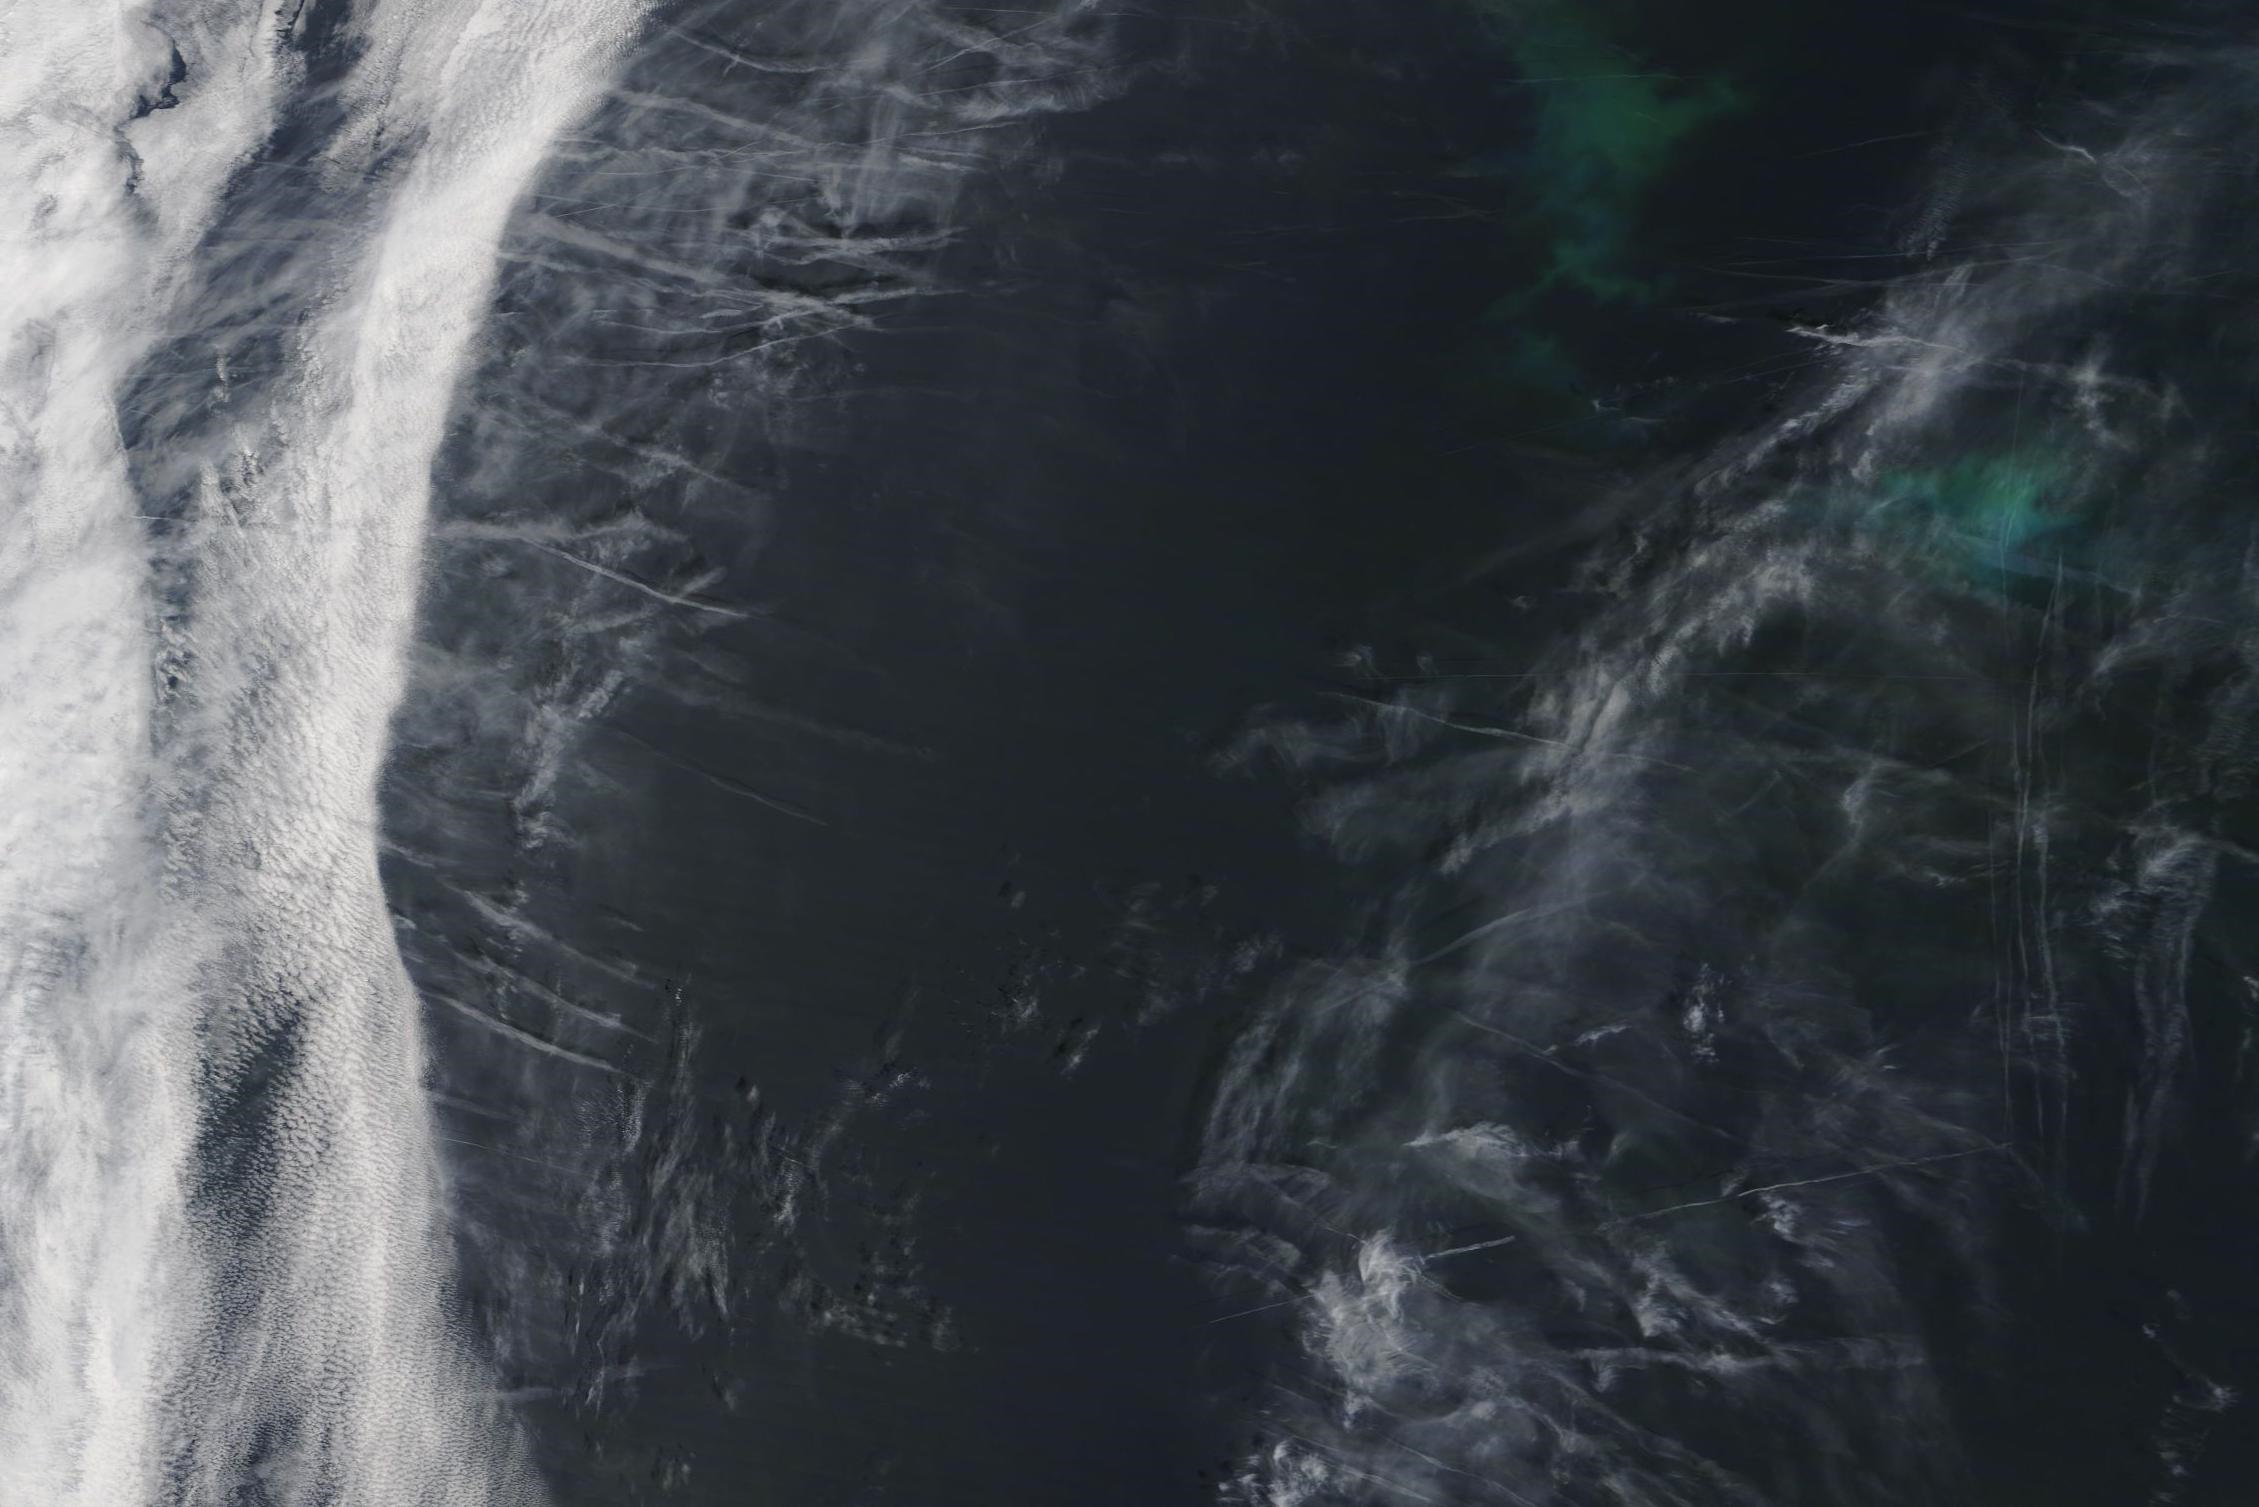 chemtrail geoengineering Shannon, Finisterre, Sole, May 13 2019 ...https://go.nasa.gov/2E5LPoa